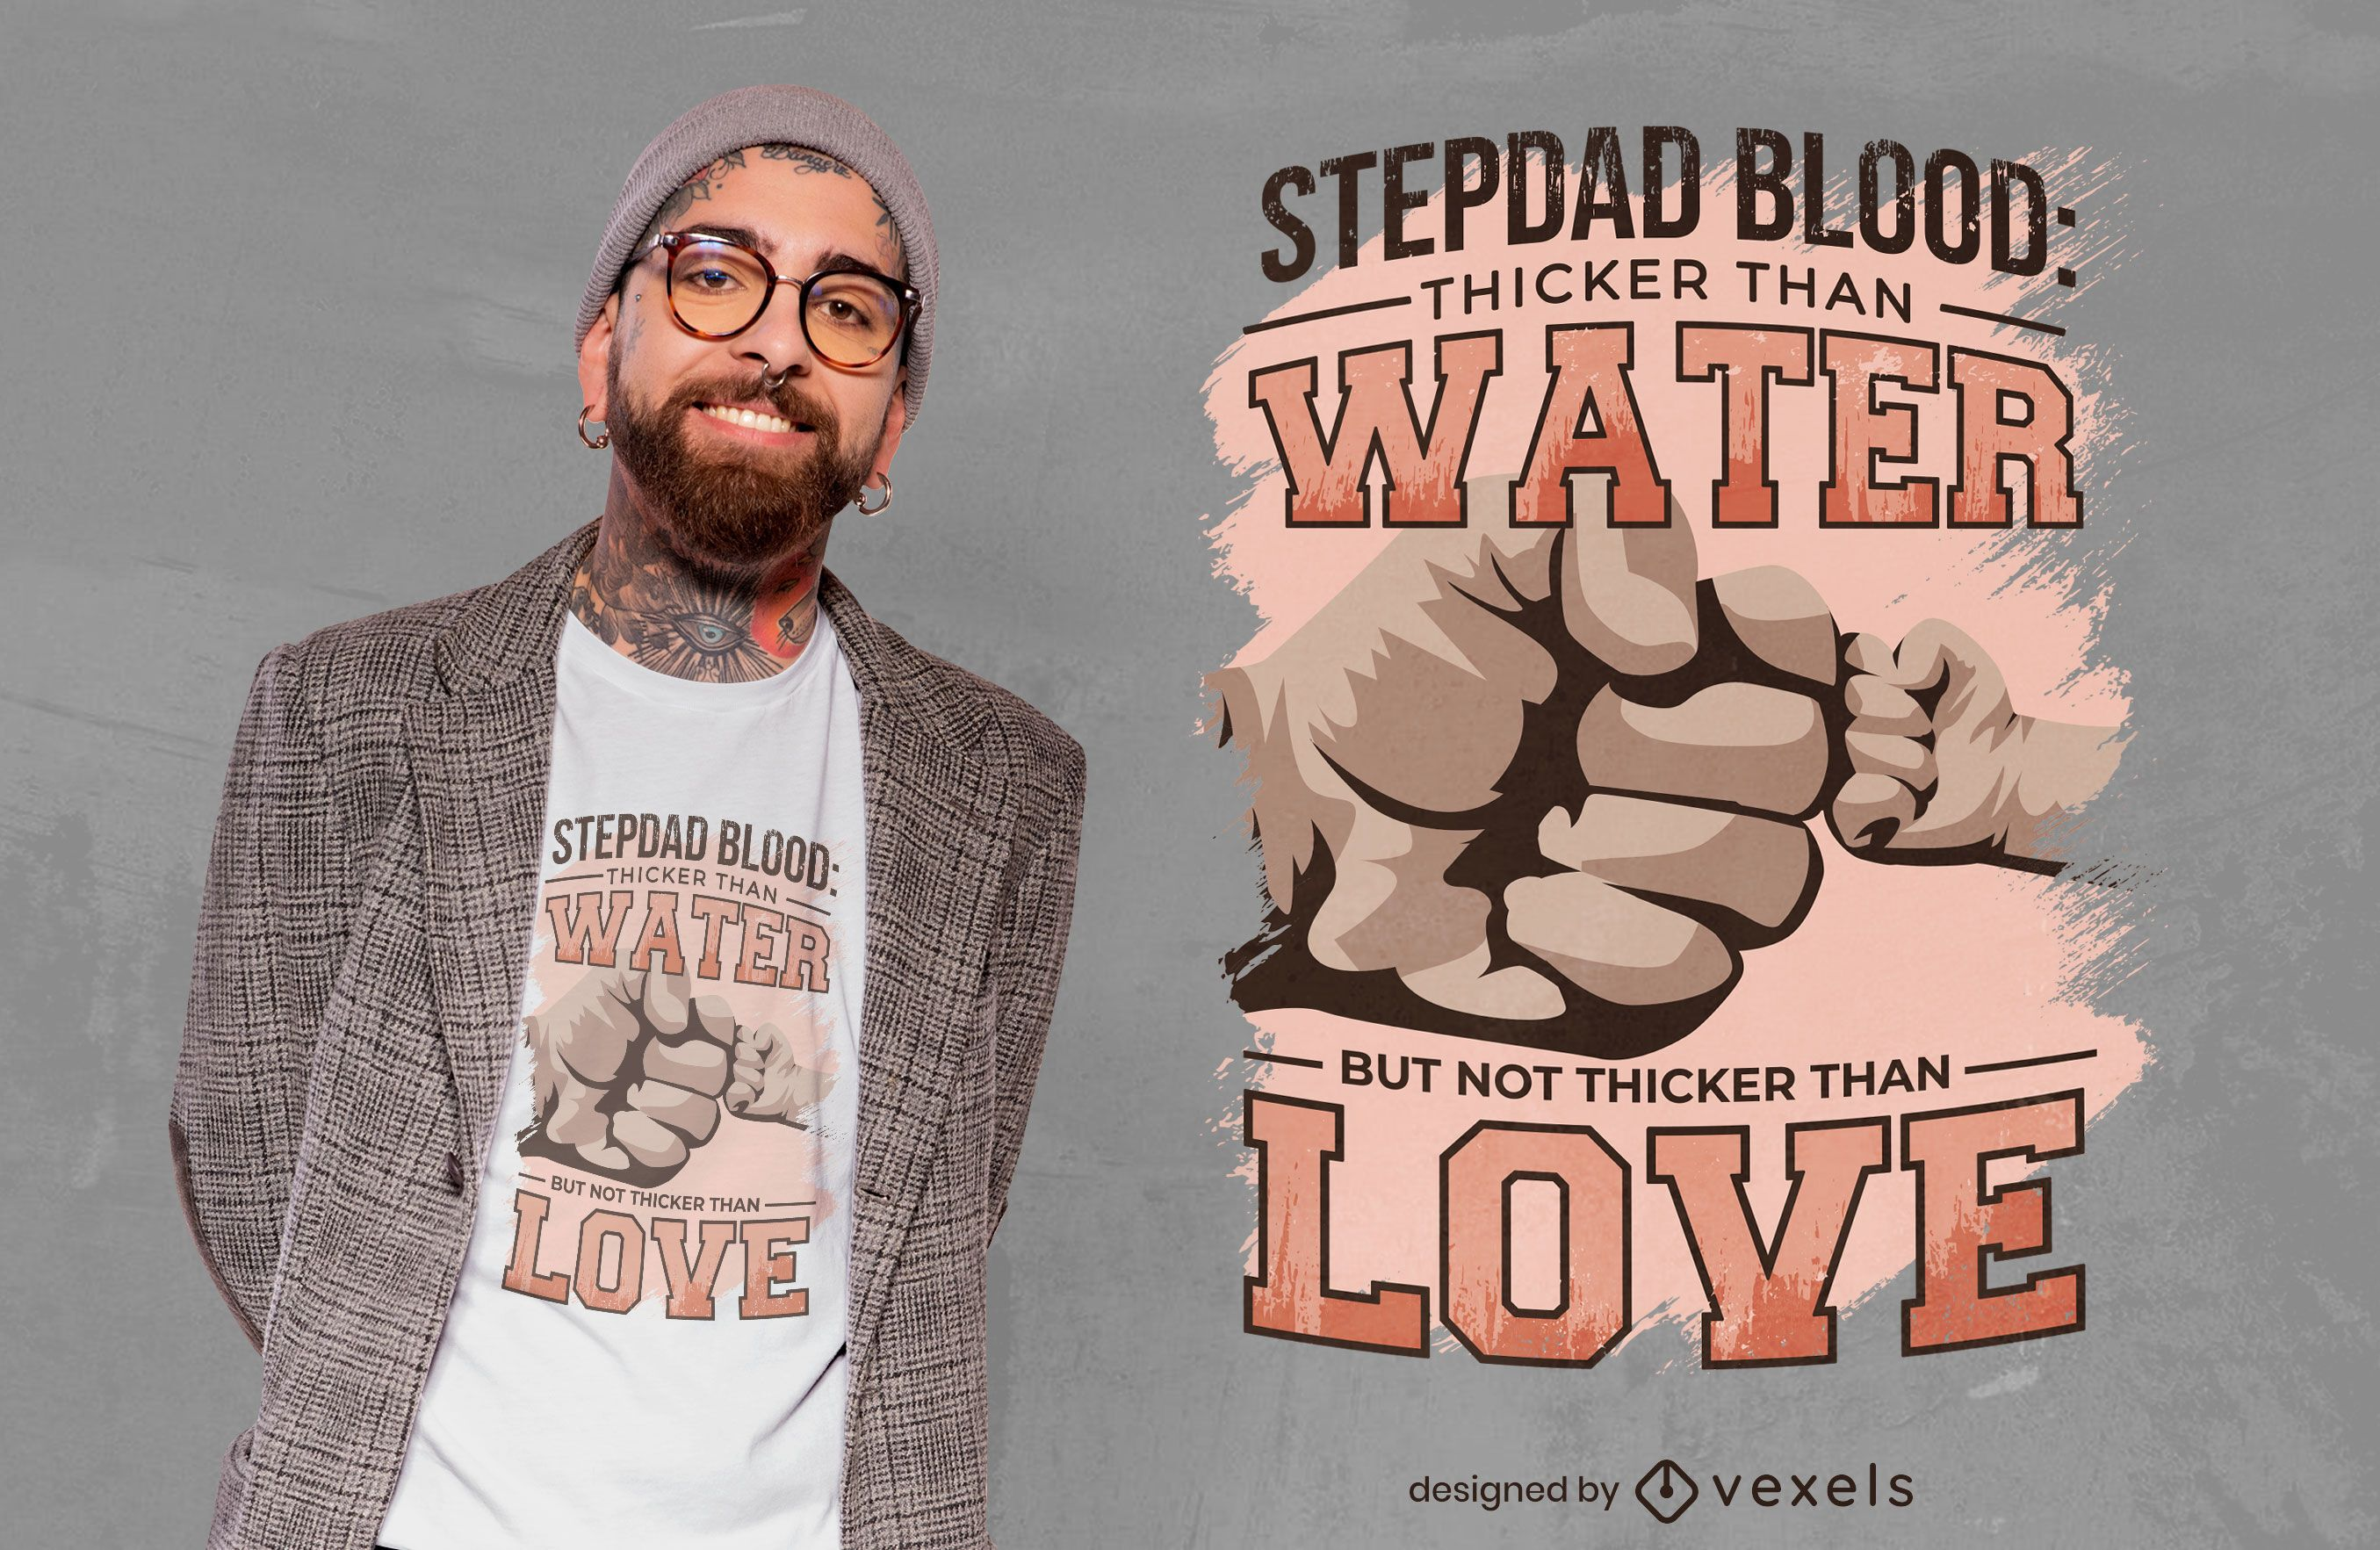 Stepdad fist bump quote t-shirt design